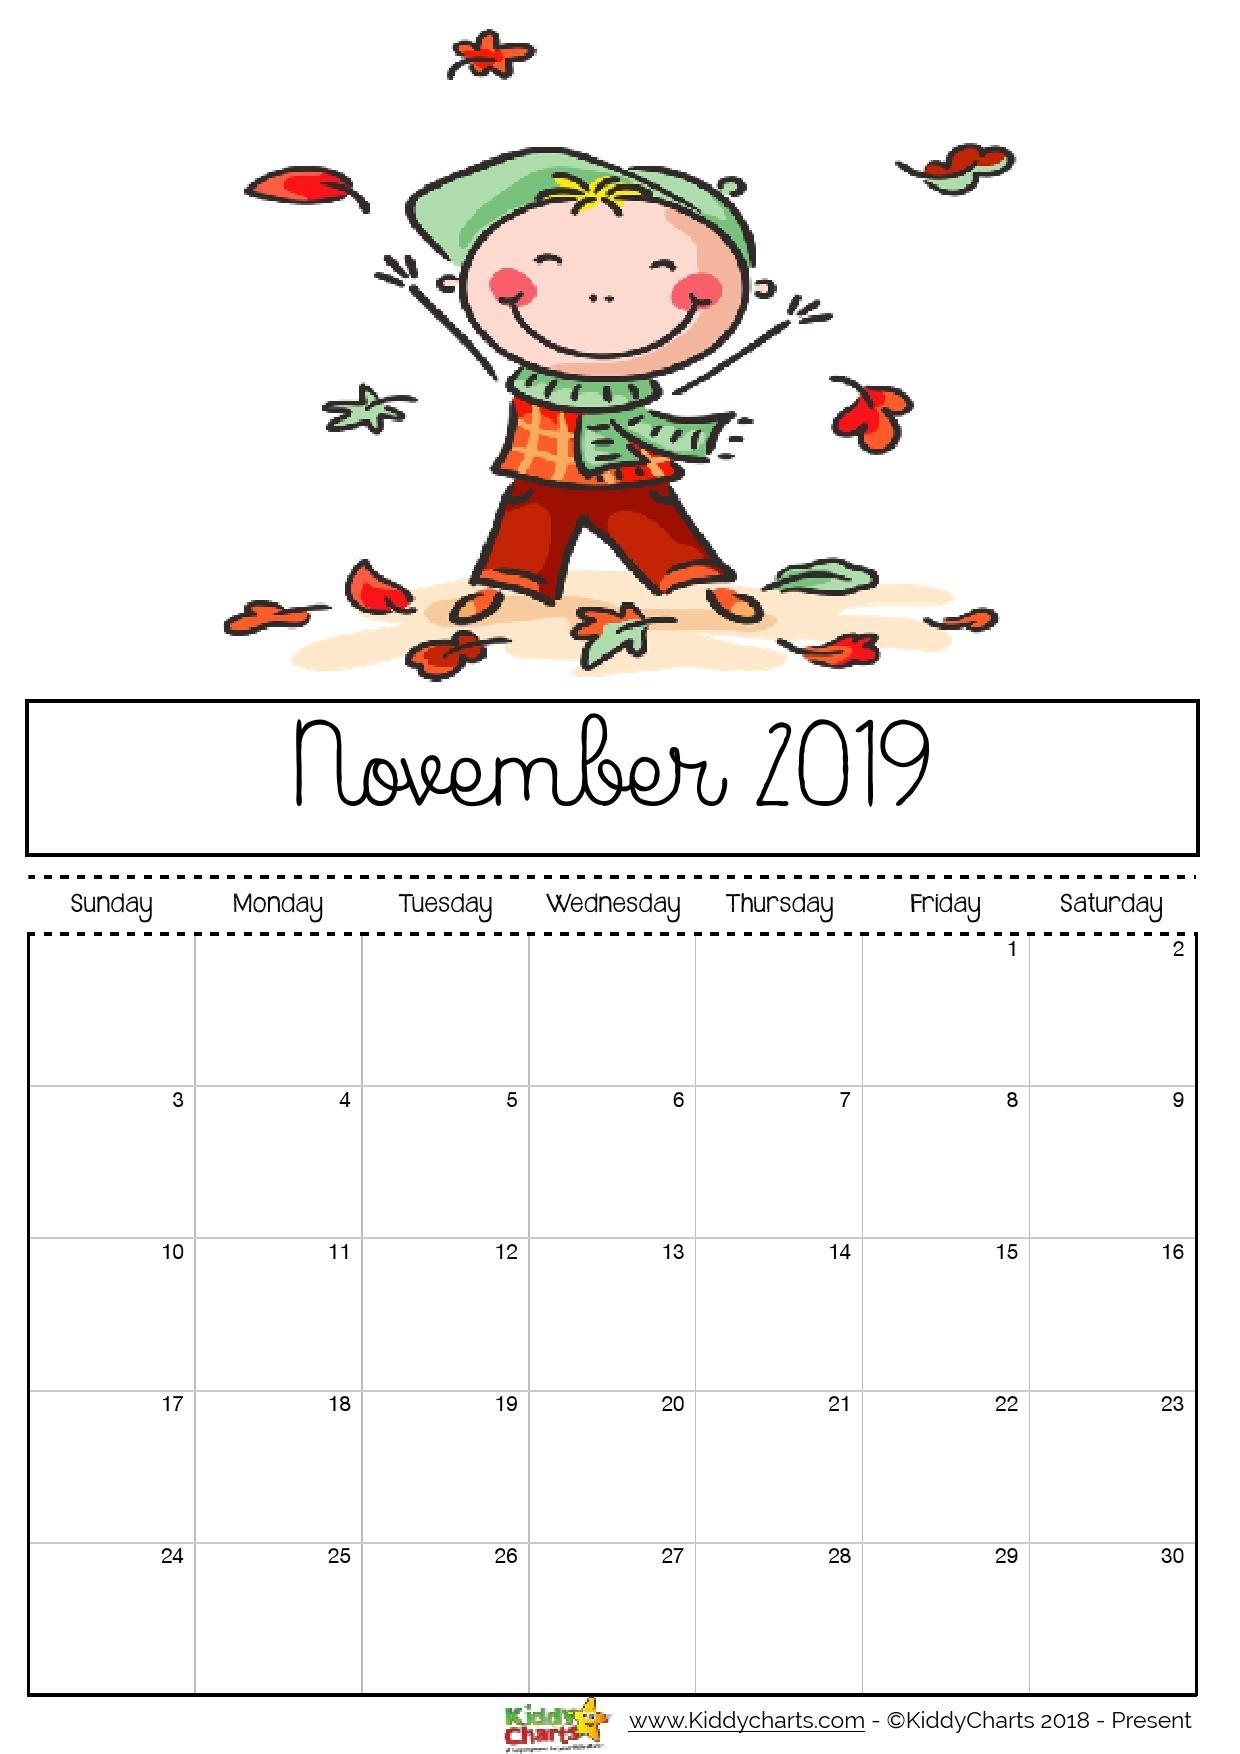 Free Printable 2019 Calendar - Print Yours Here | Kiddycharts